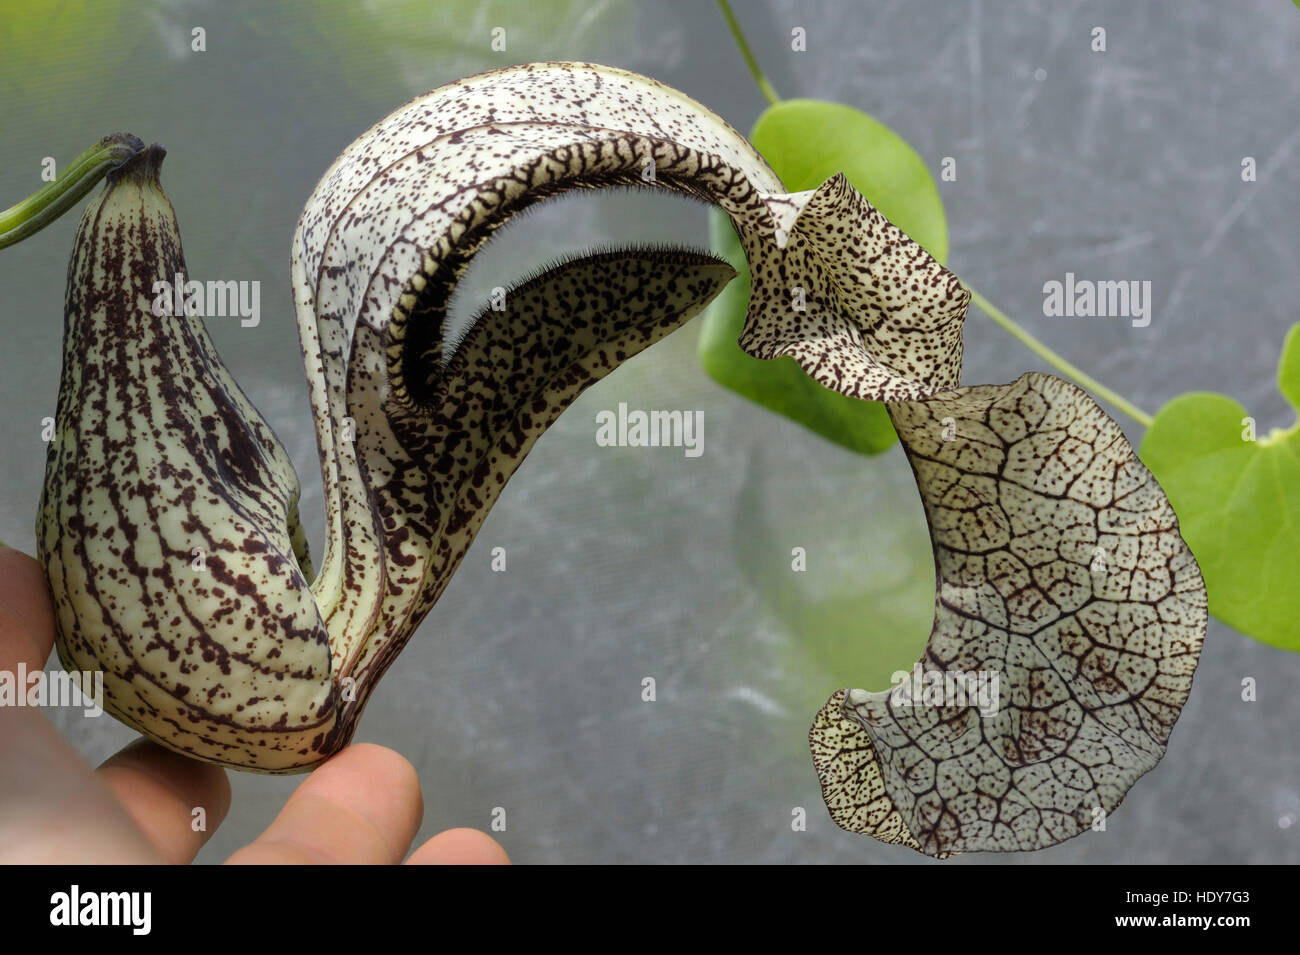 Tình yêu cây cỏ ĐV2 - Page 3 Aristolochia-cymbifera-from-minas-gerais-brazil-HDY7G3